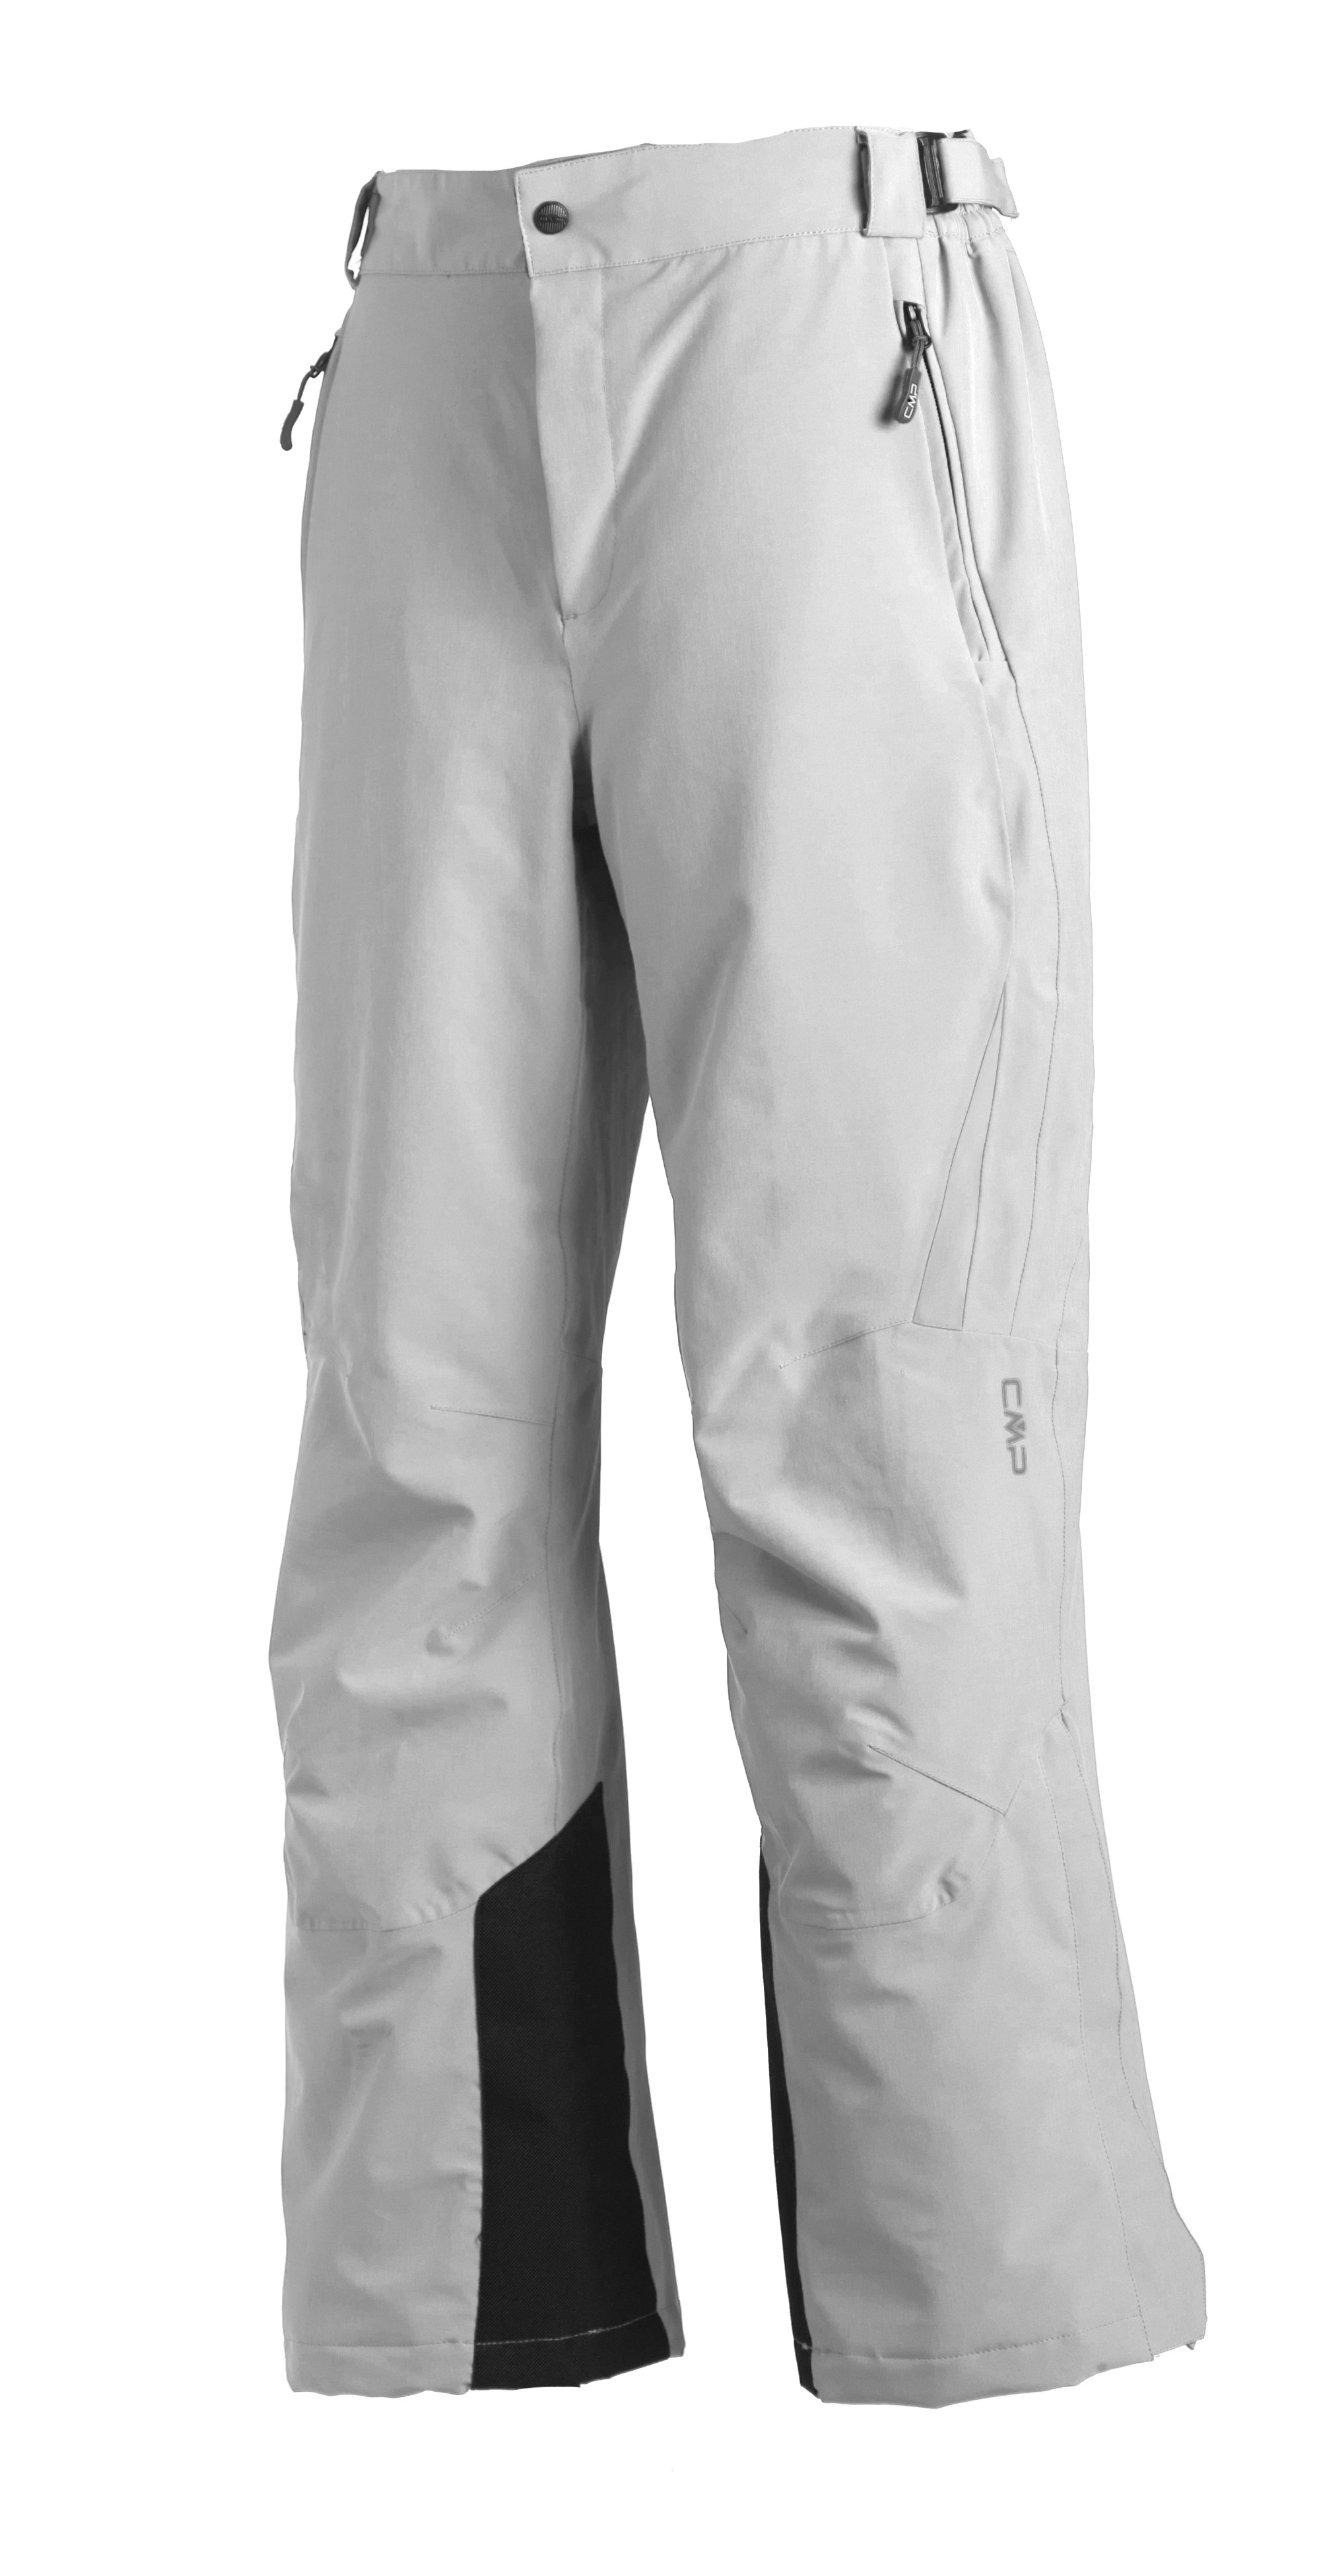 f2aa684222 CMP Skihose 3W18596N, Pantaloni Da Sci Donna, Bianco, 42